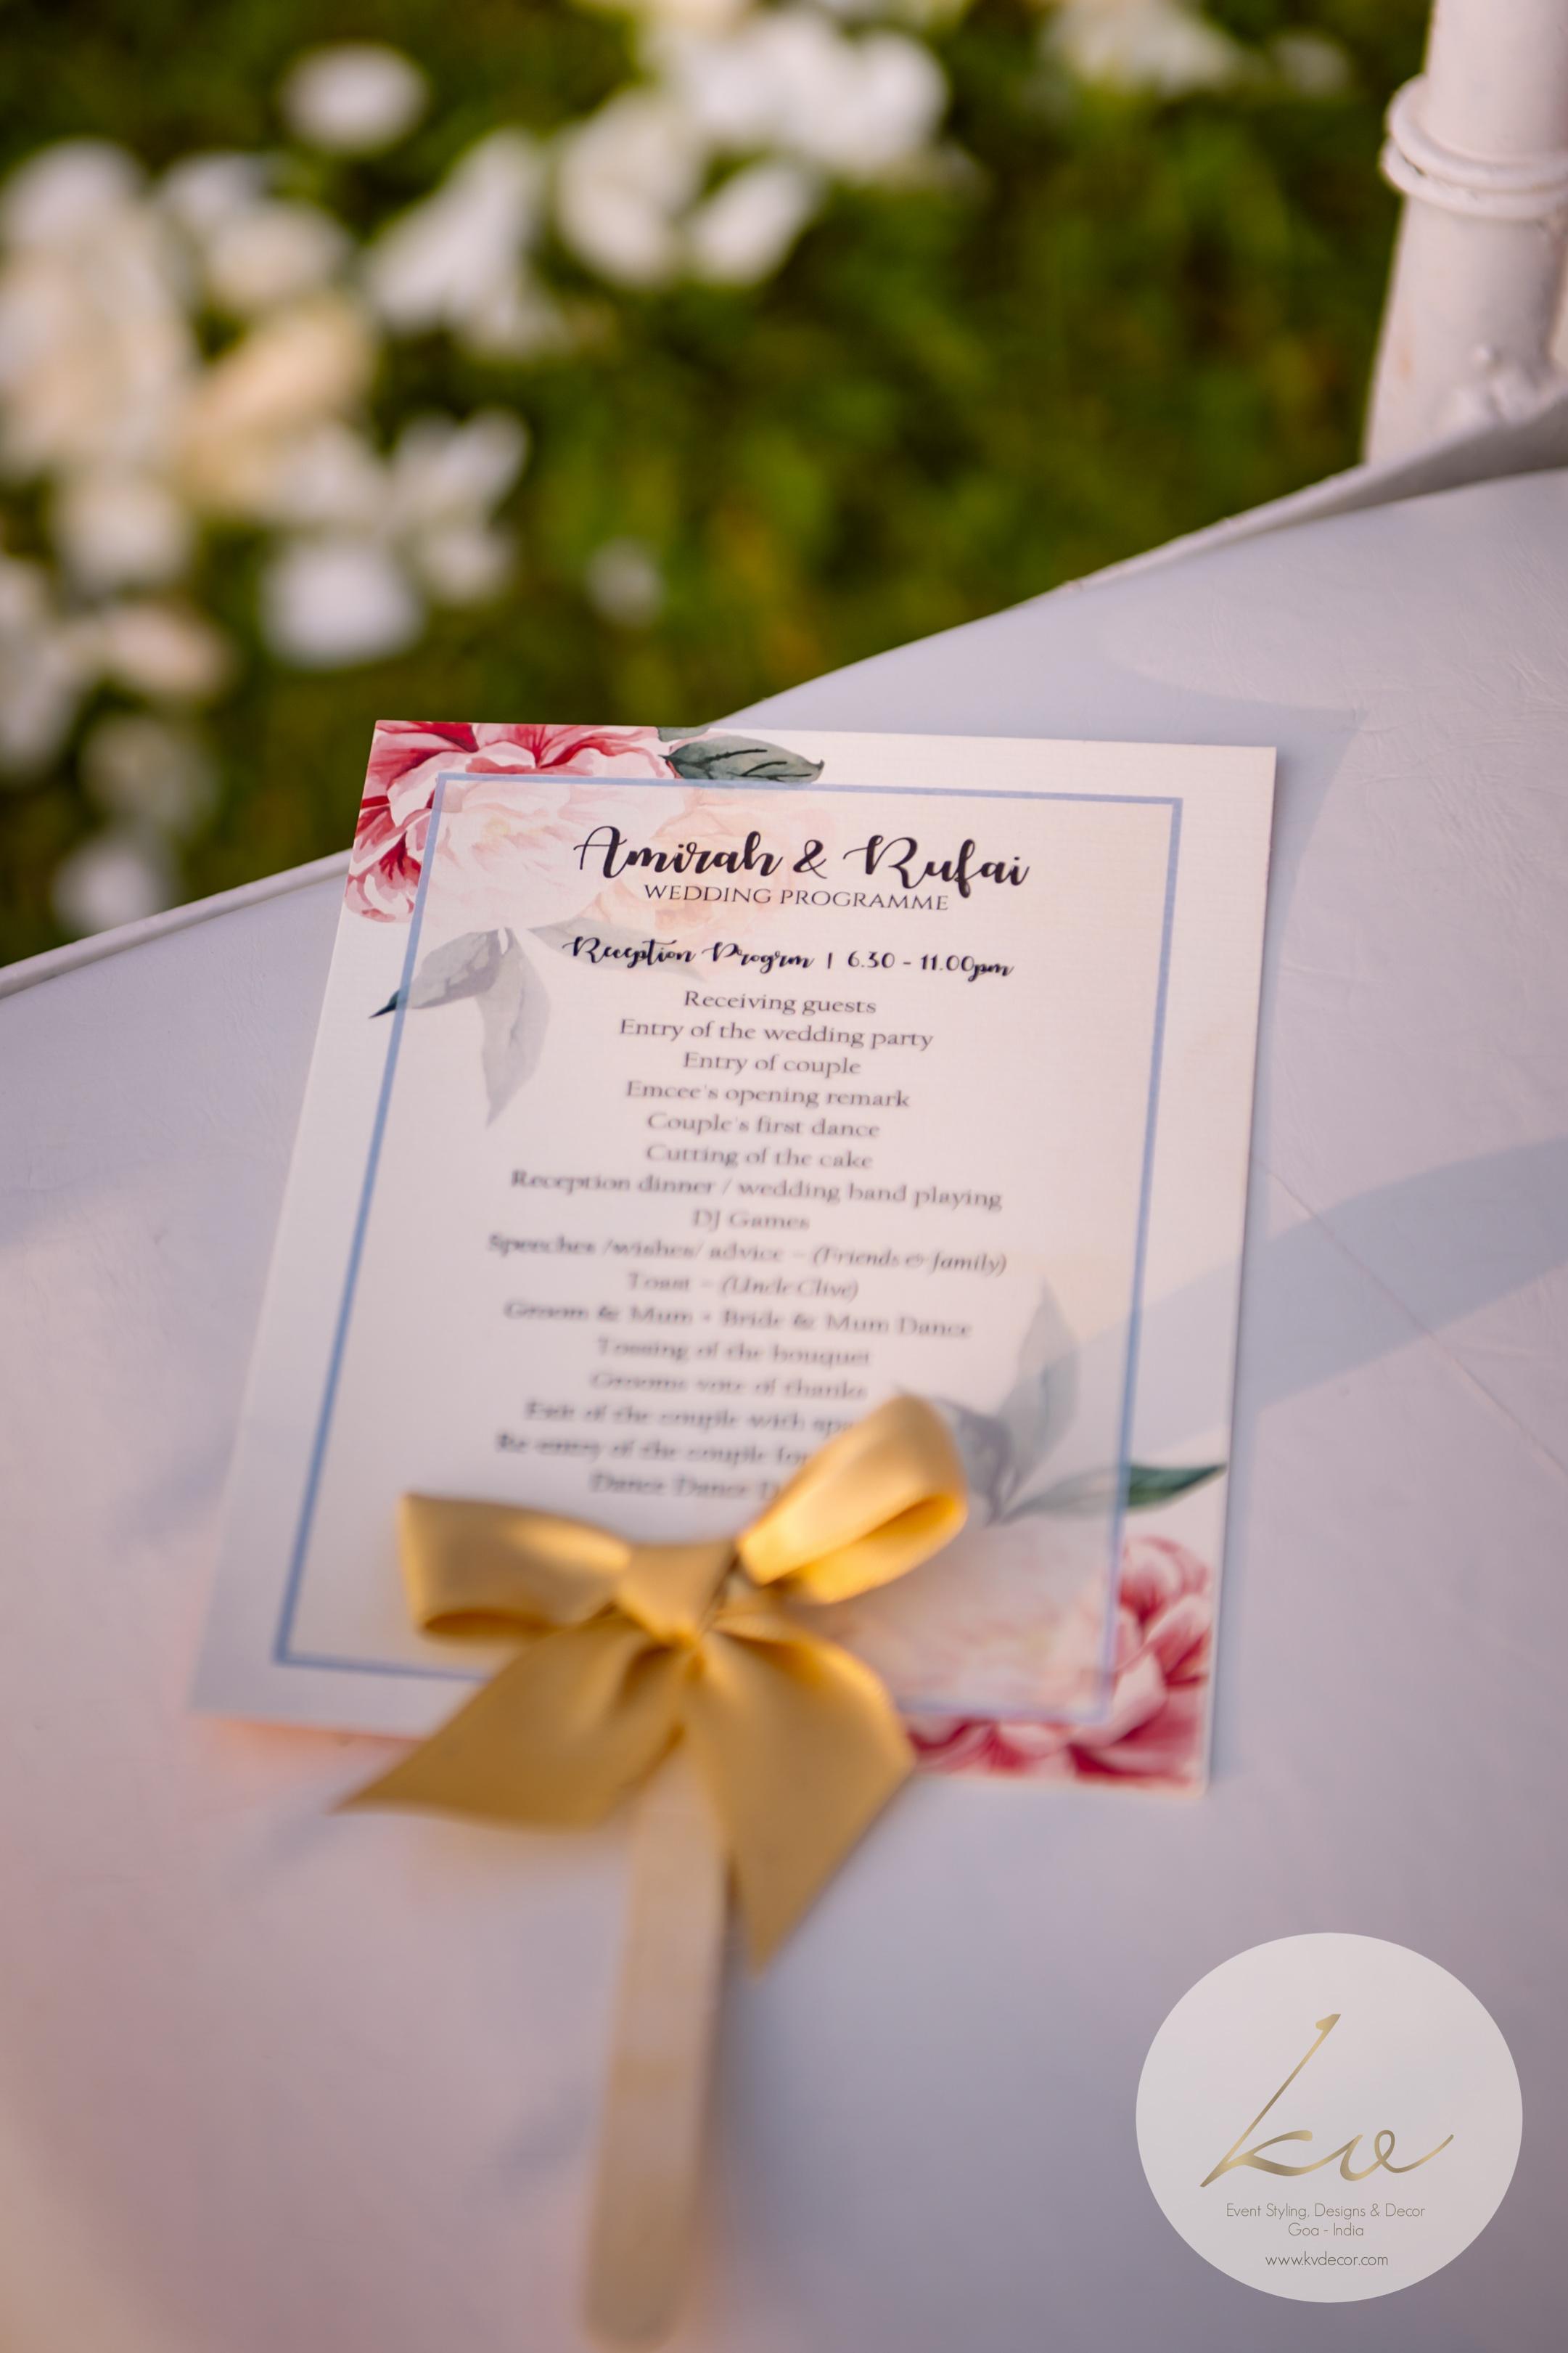 ... the wedding program!